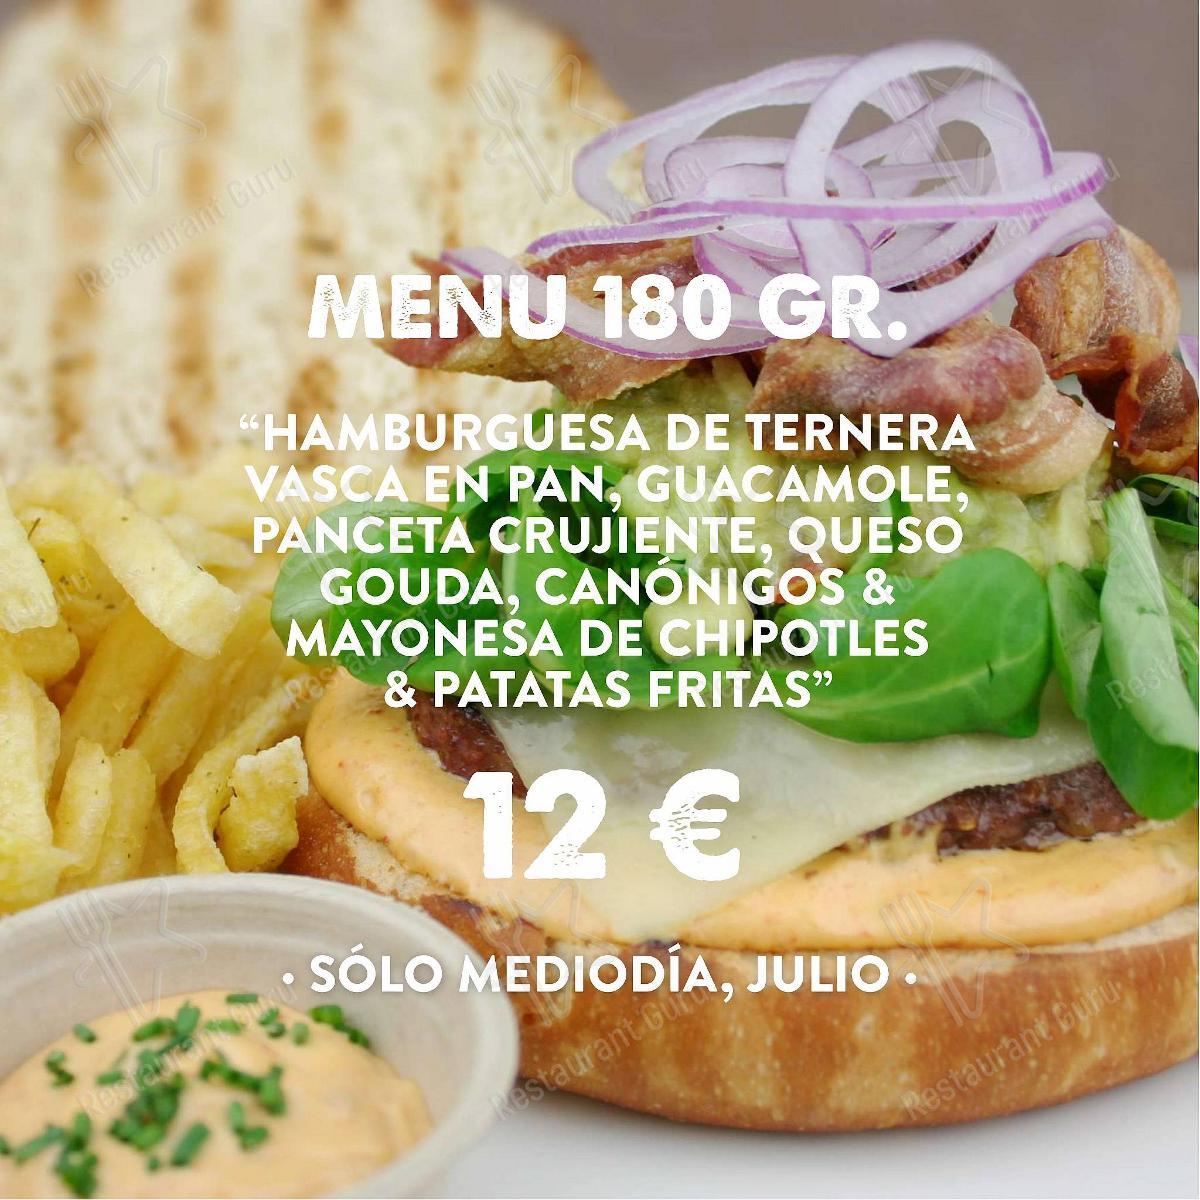 Hamburguesería Jalos menu - meals and drinks